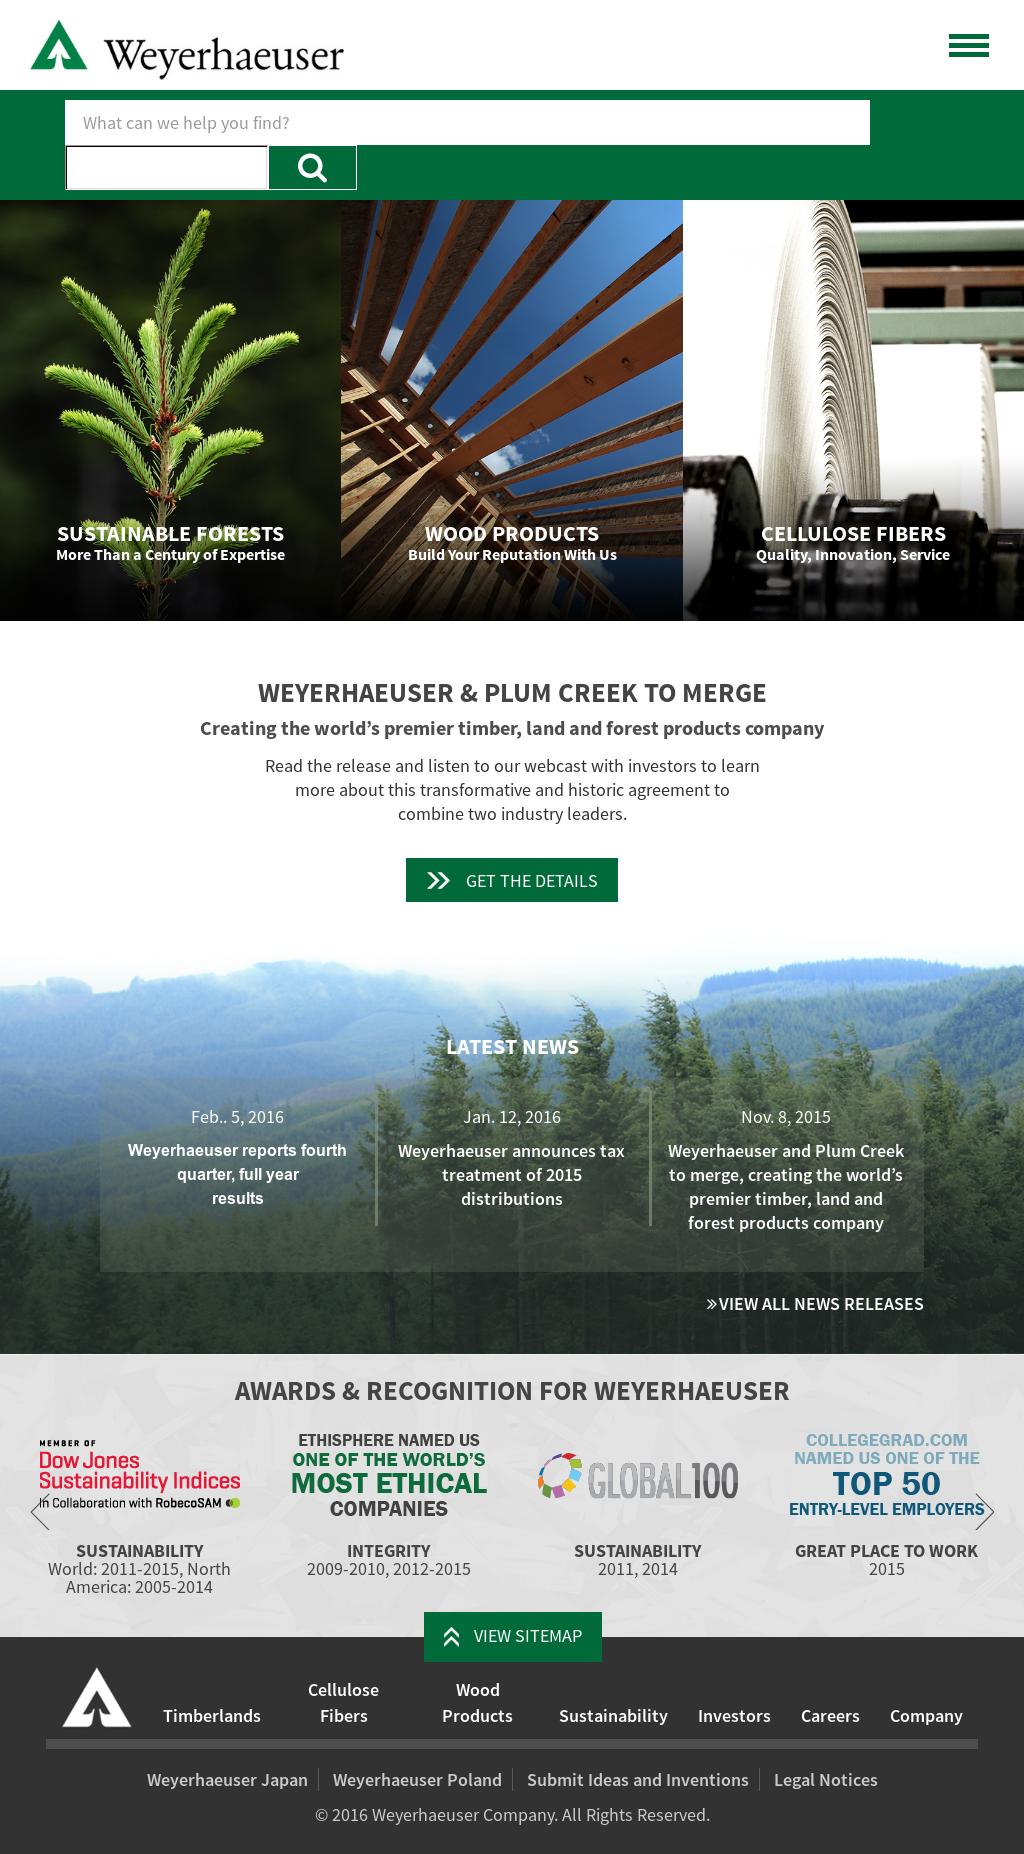 Weyerhaeuser Competitors, Revenue and Employees - Owler Company Profile